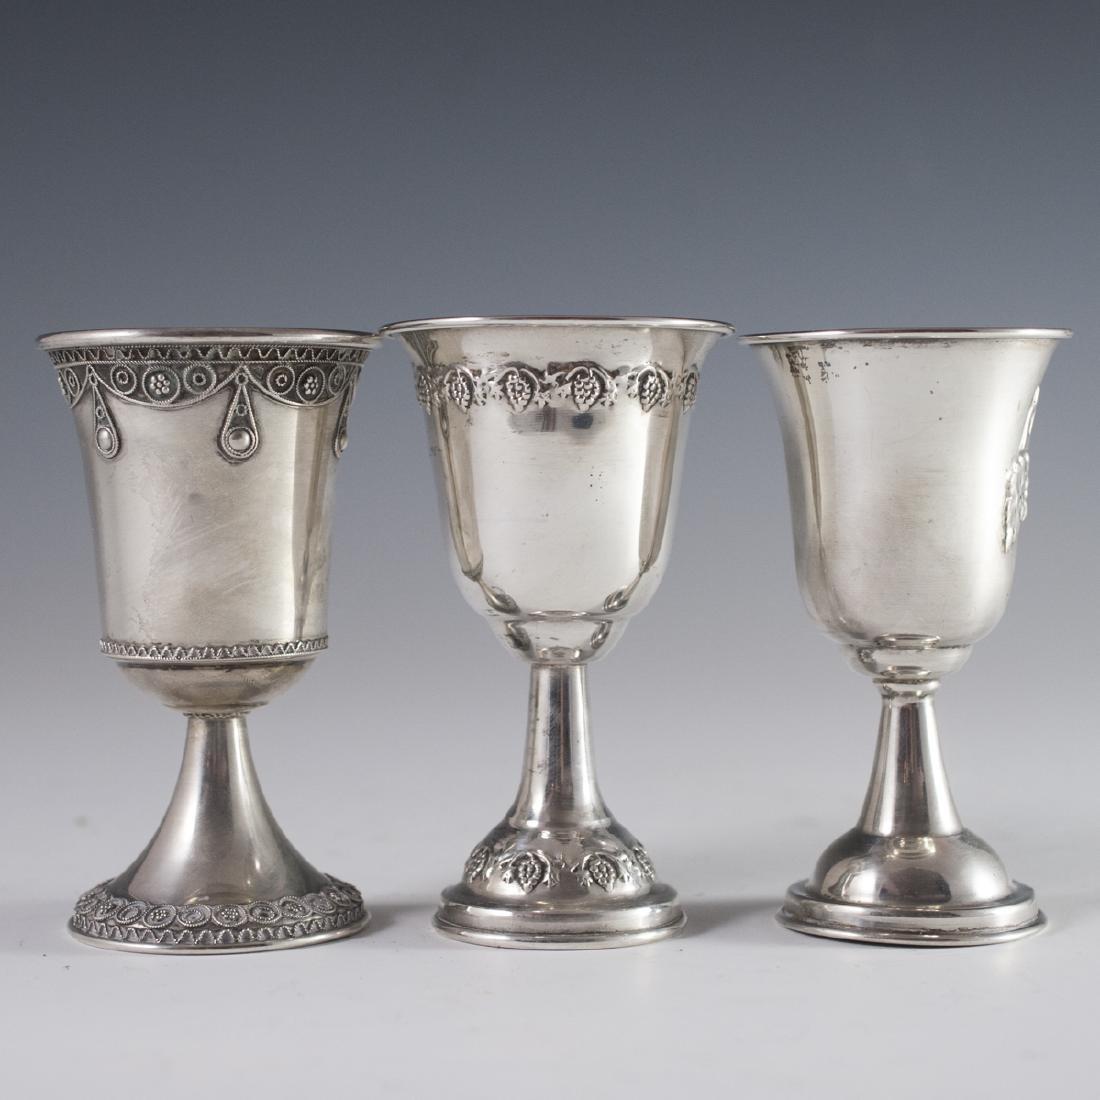 800 Silver Kiddush Cups